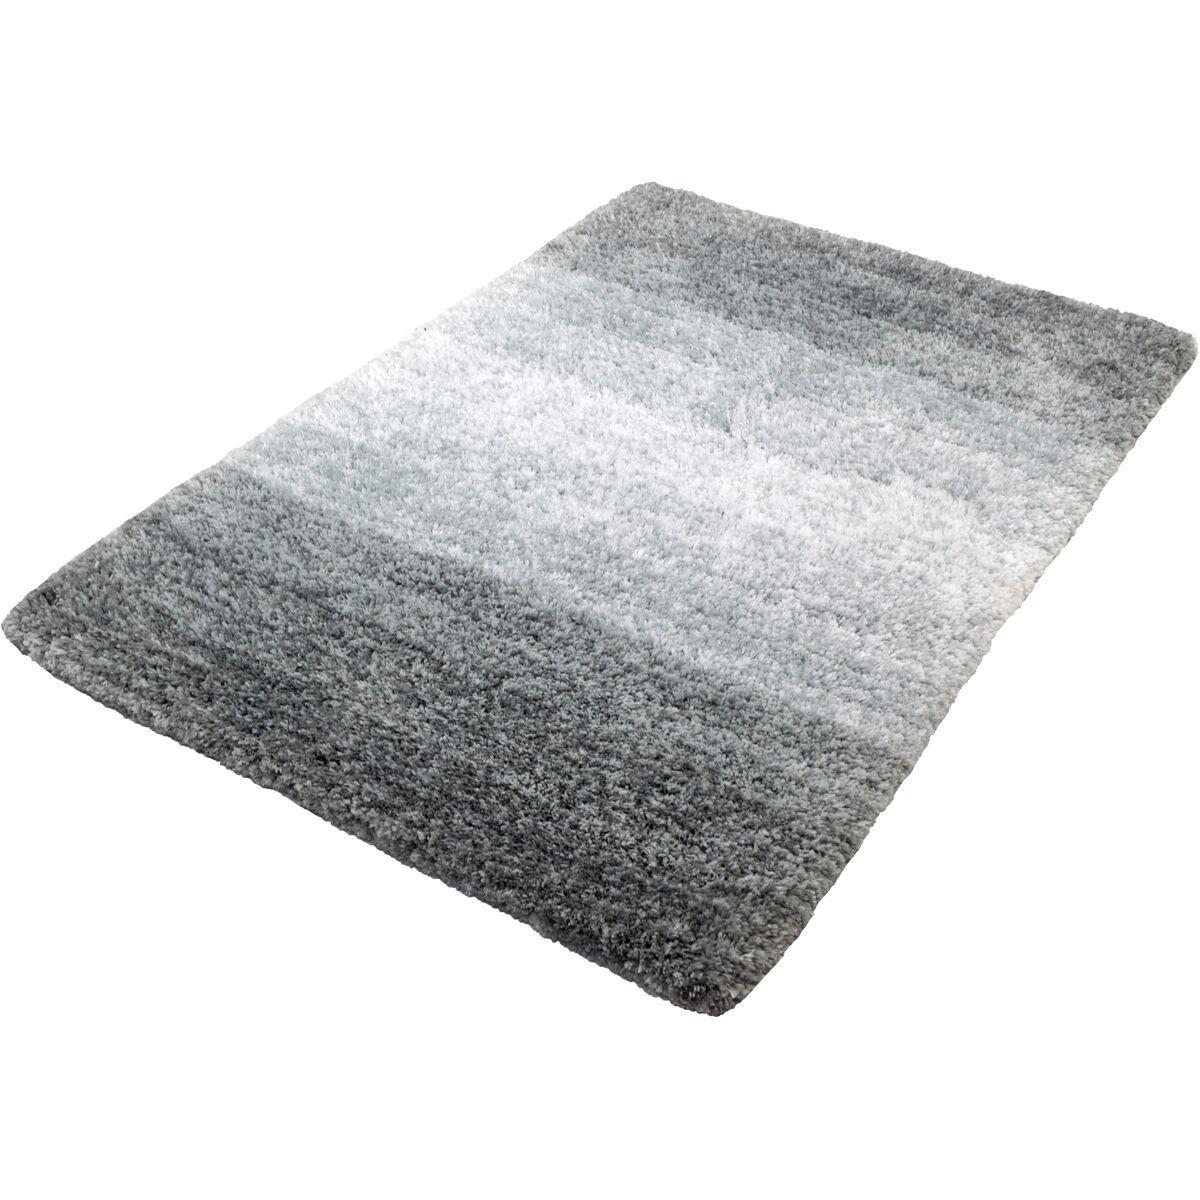 Badgarnitur Grau Weiß